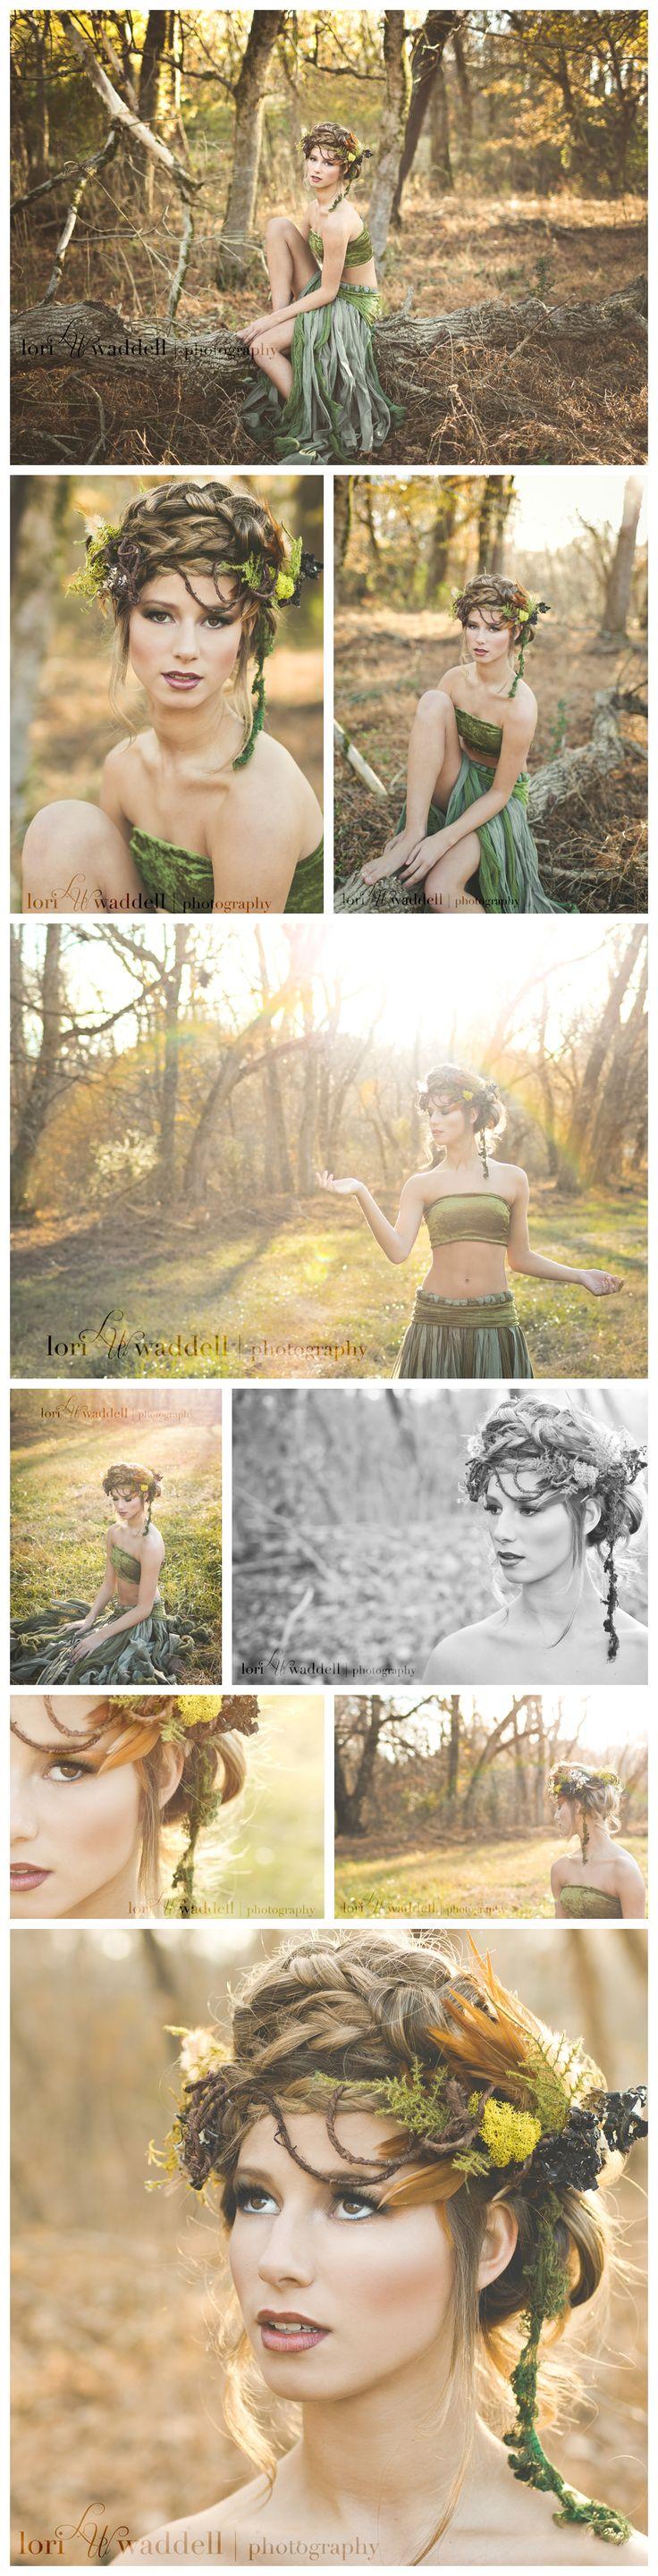 Concept Photographer Atlanta, Styled photo session Atlanta | Marietta, | Atlanta Marietta Photographer